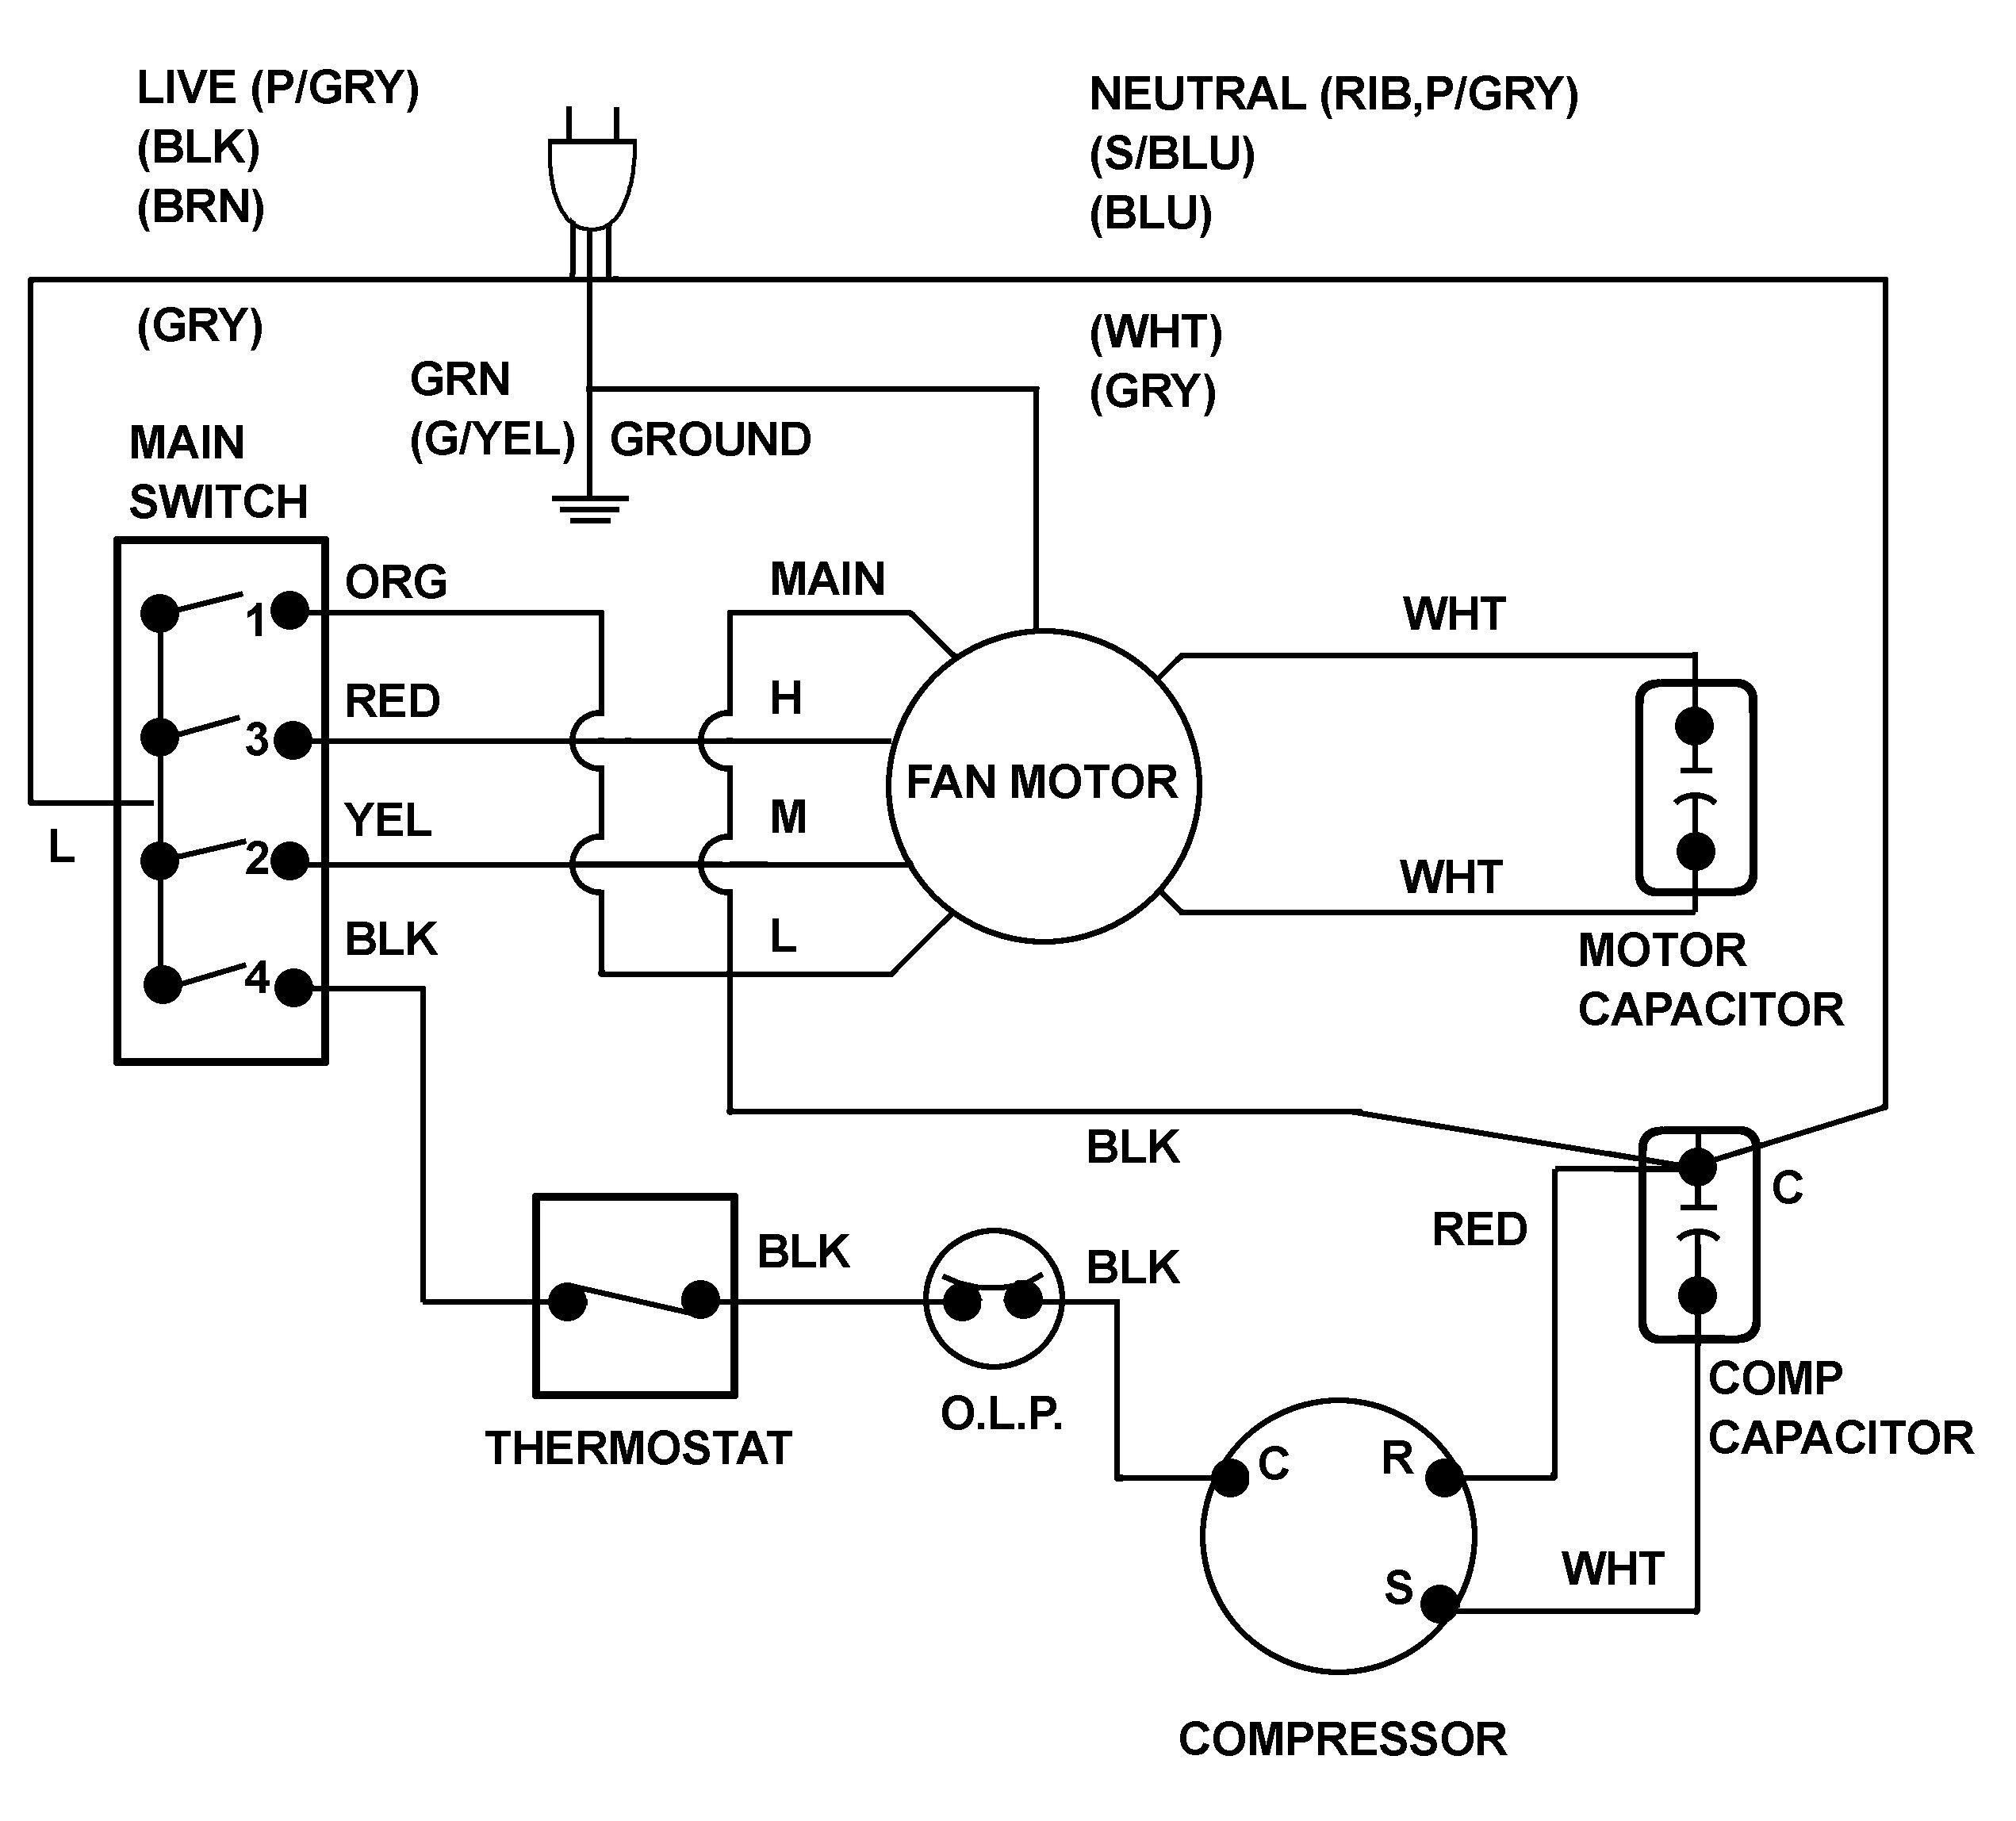 Wiring Diagram Ac Cassette Diagram Diagramtemplate Diagramsample Thermostat Wiring Circuit Diagram Electrical Circuit Diagram